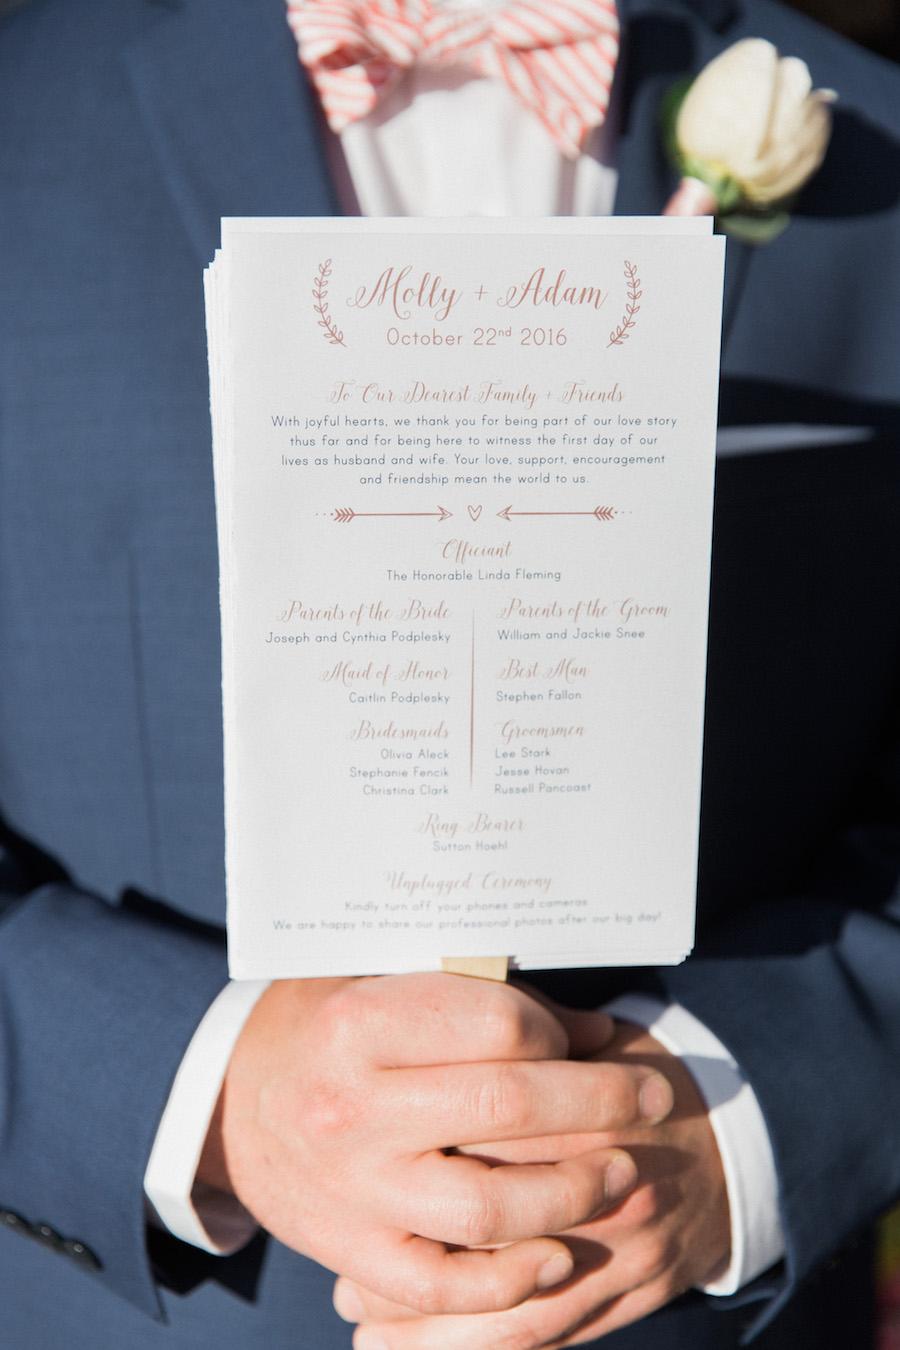 Blush and ivory ceremony program | Beach wedding | Wedding ceremony program fan